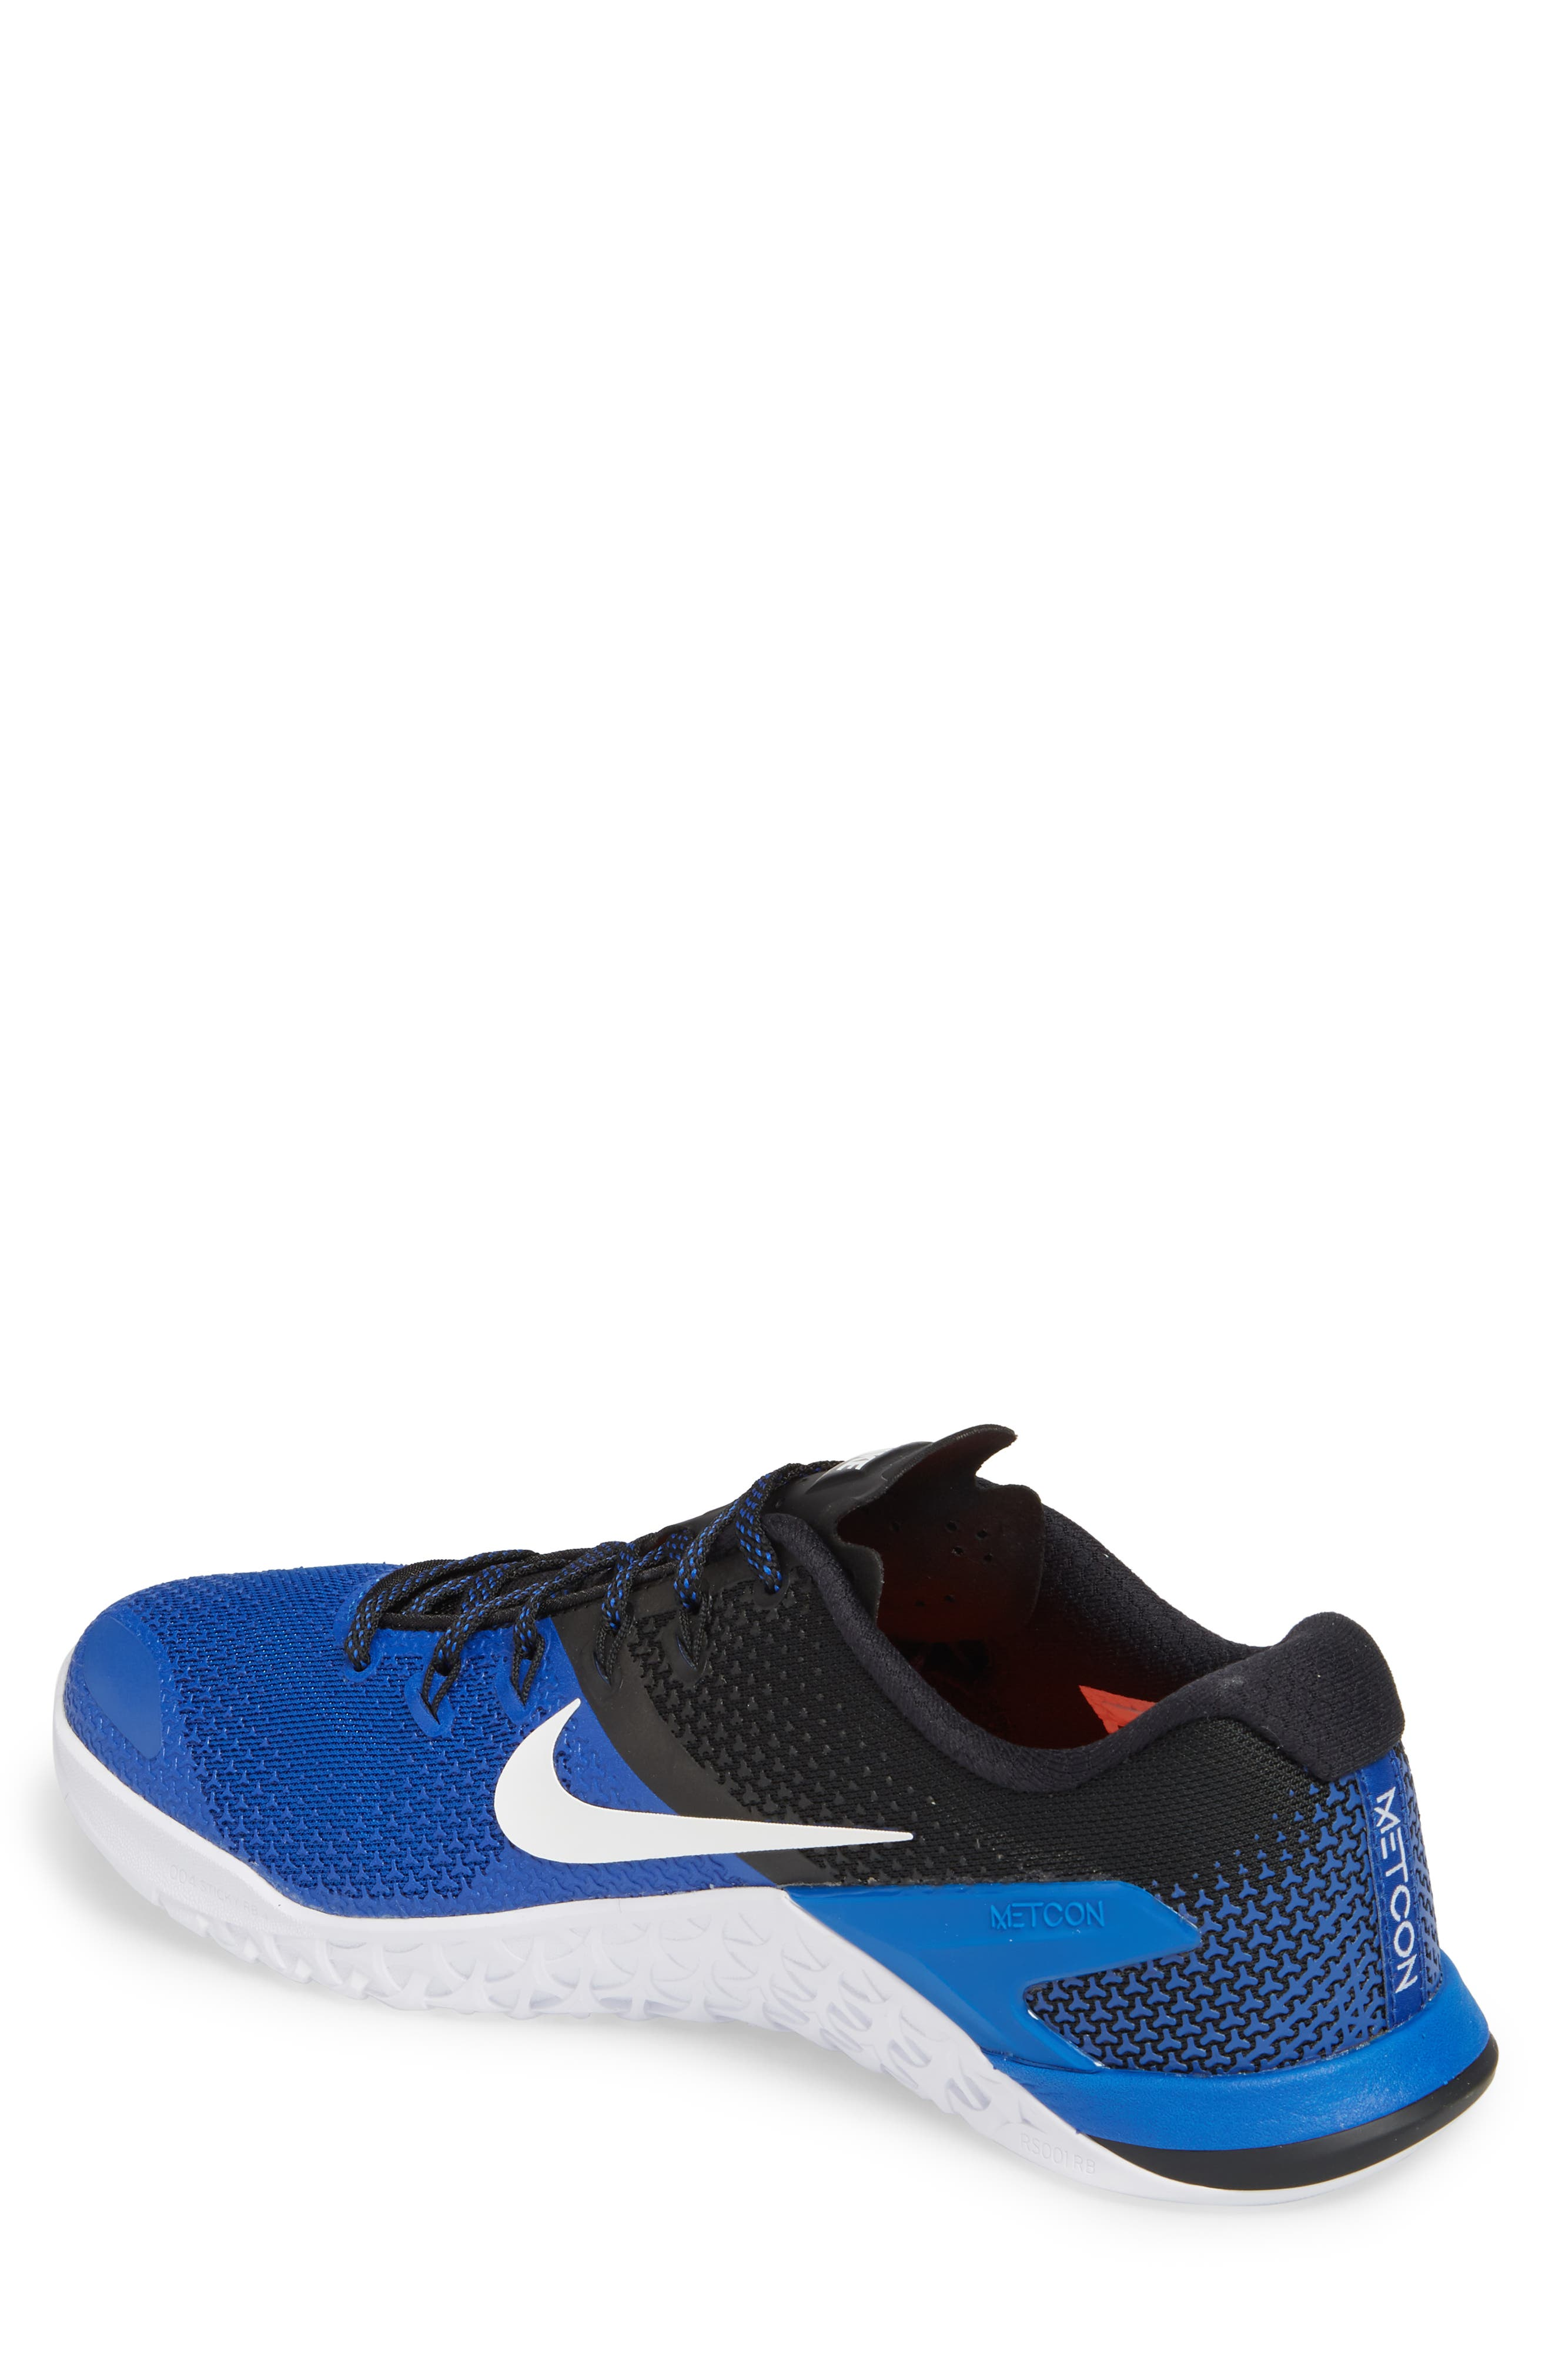 Metcon 4 Training Shoe,                             Alternate thumbnail 2, color,                             410